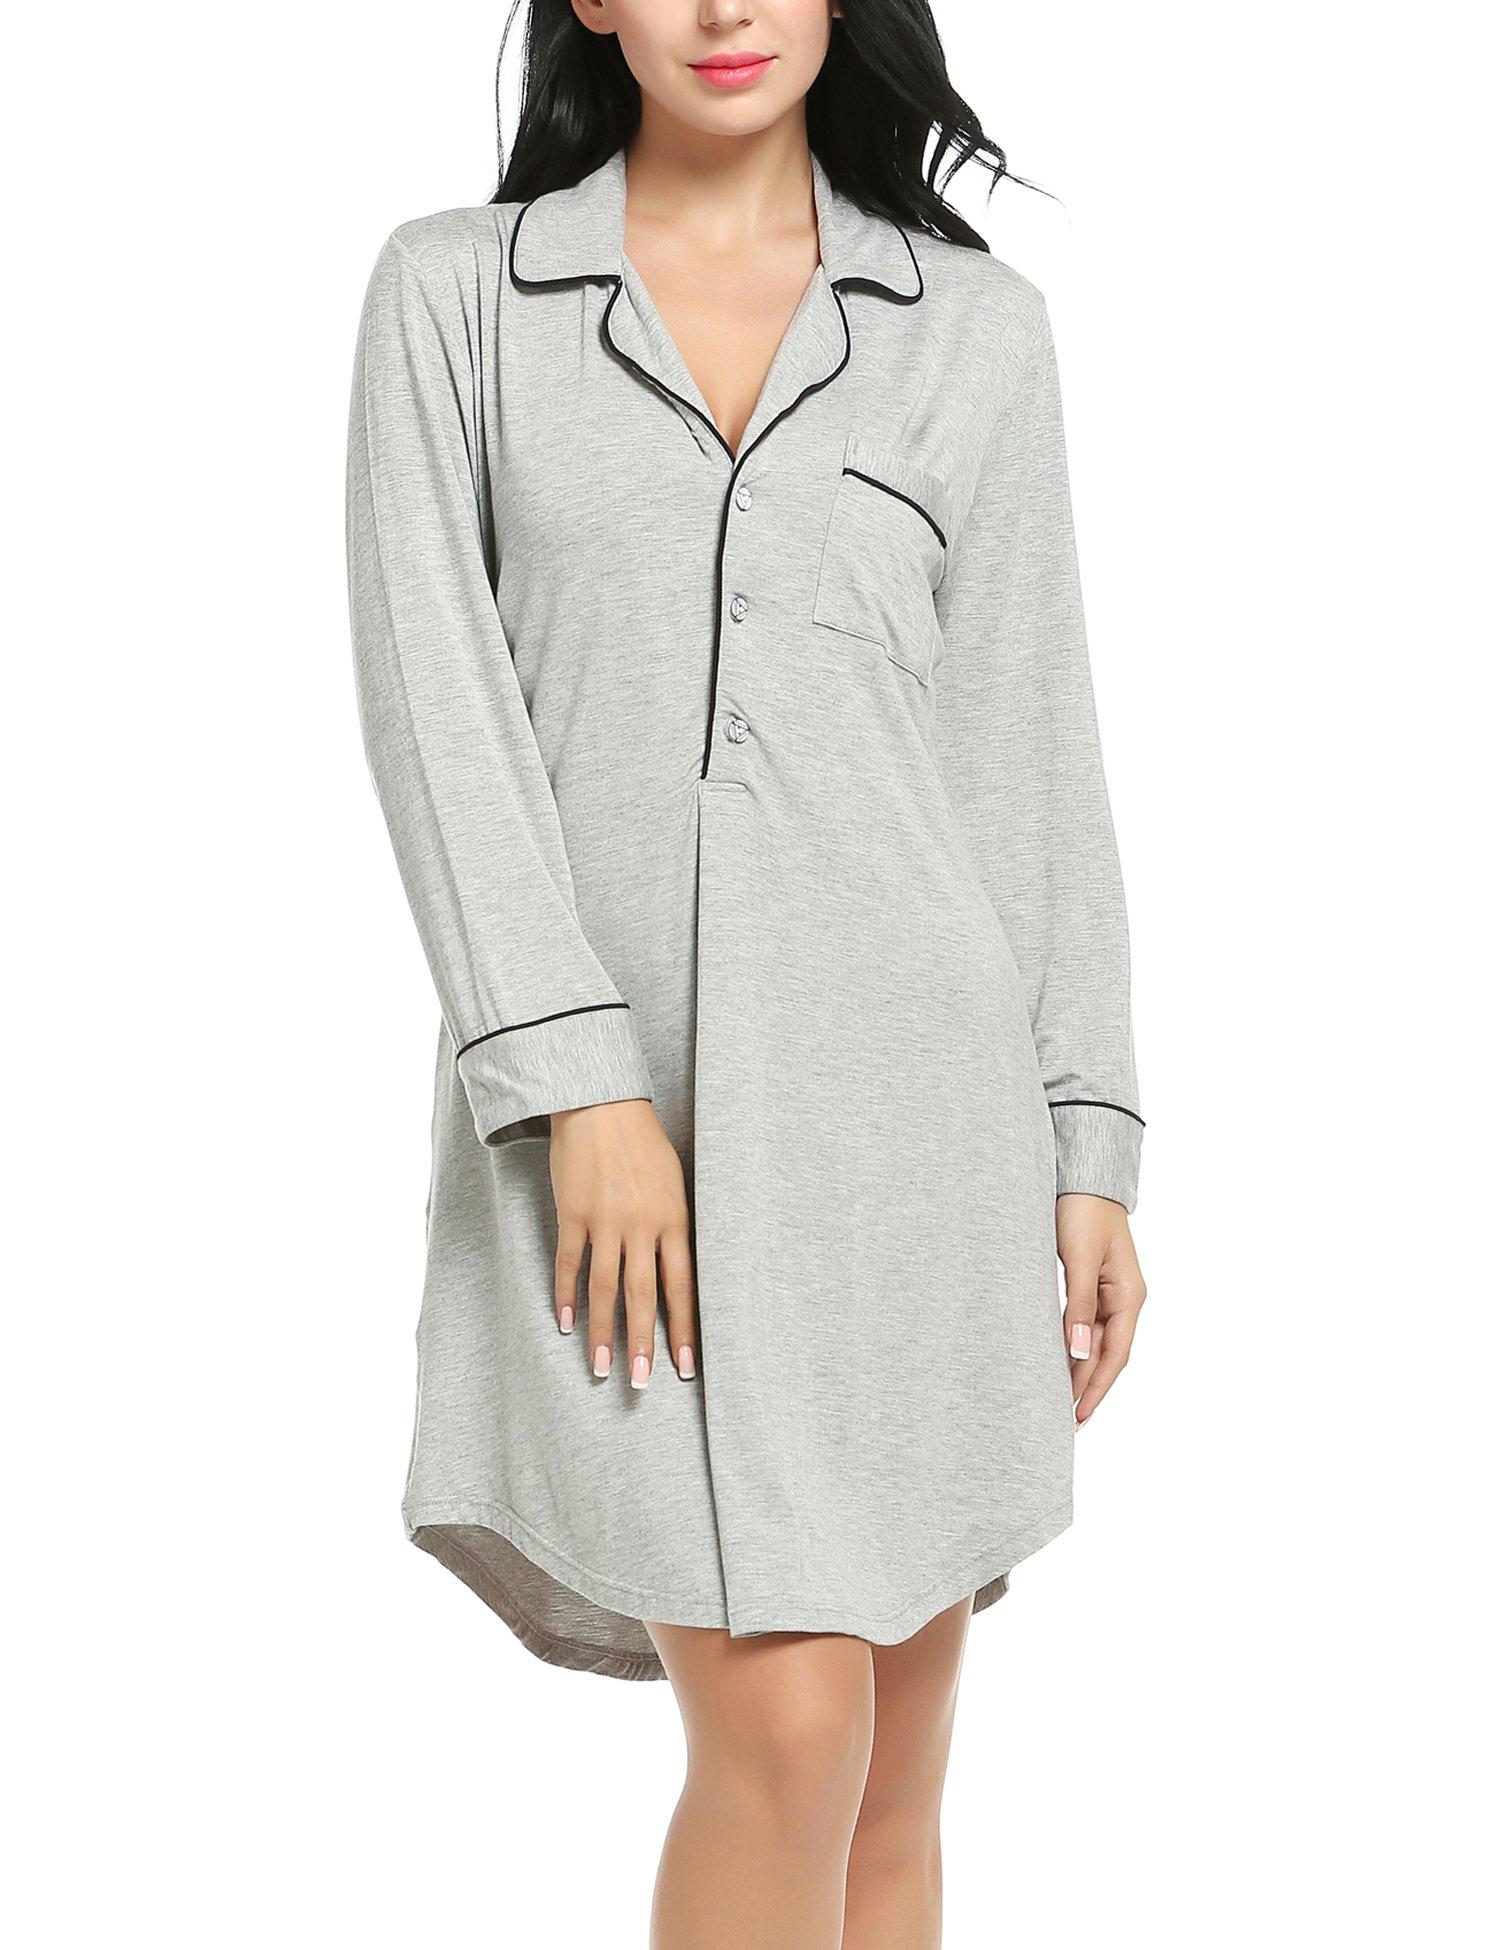 Ekouaer Nightgown Button Down Nightshirt 3/4 Sleeve &Half Sleeve Pajama Top Boyfriend Sleepshirt Nightdress for Women